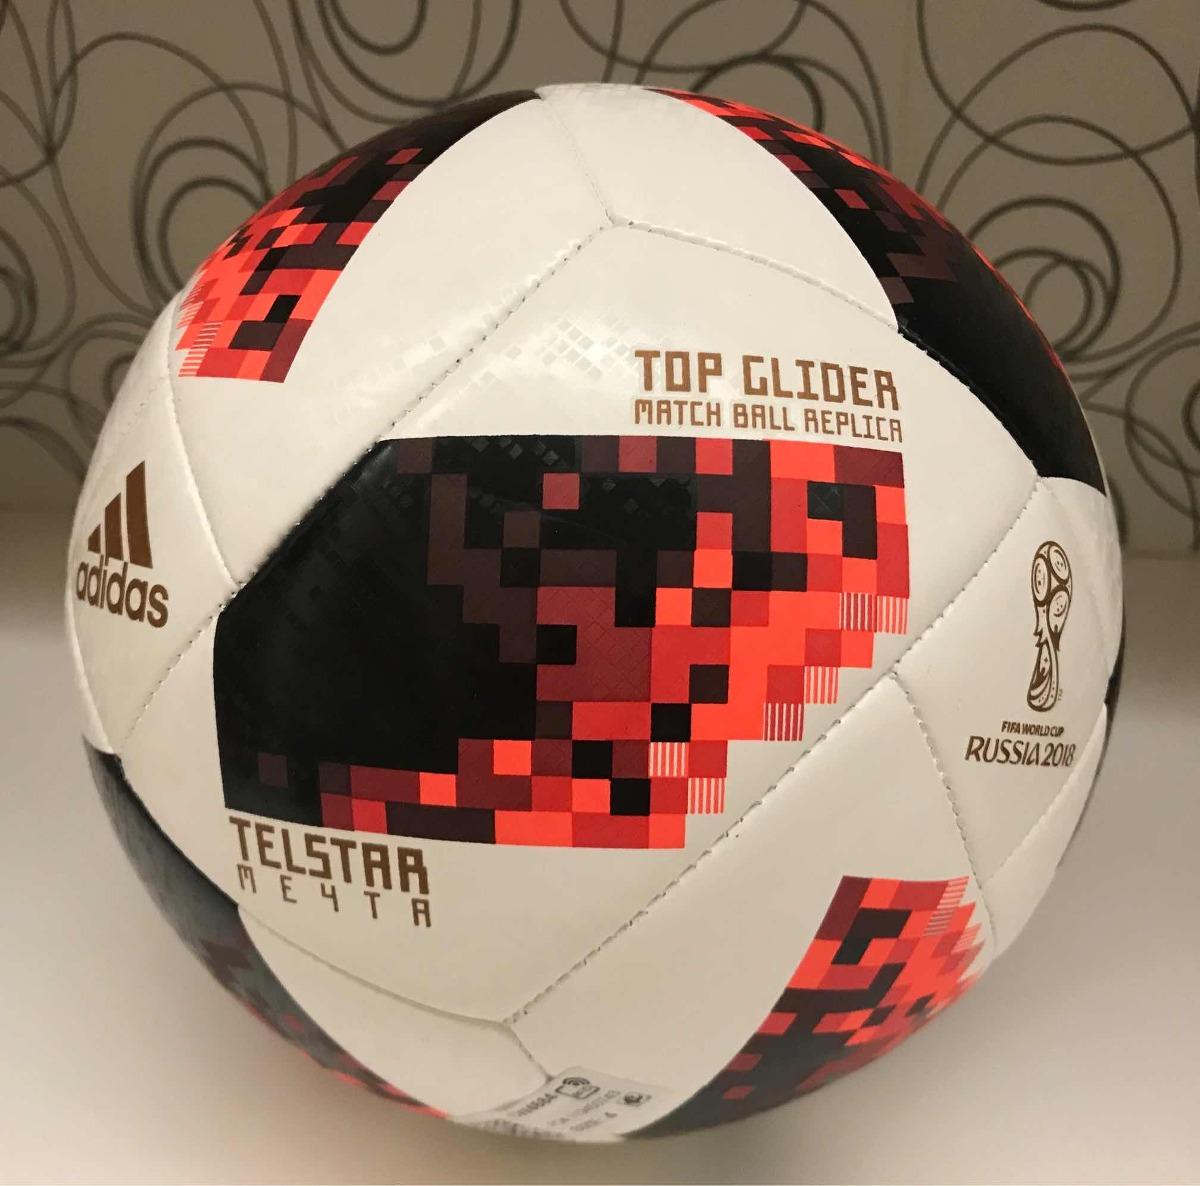 balón adidas telstar mechta  4 finales mundial rusia 2018. Cargando zoom. 9f7f0acb0def7